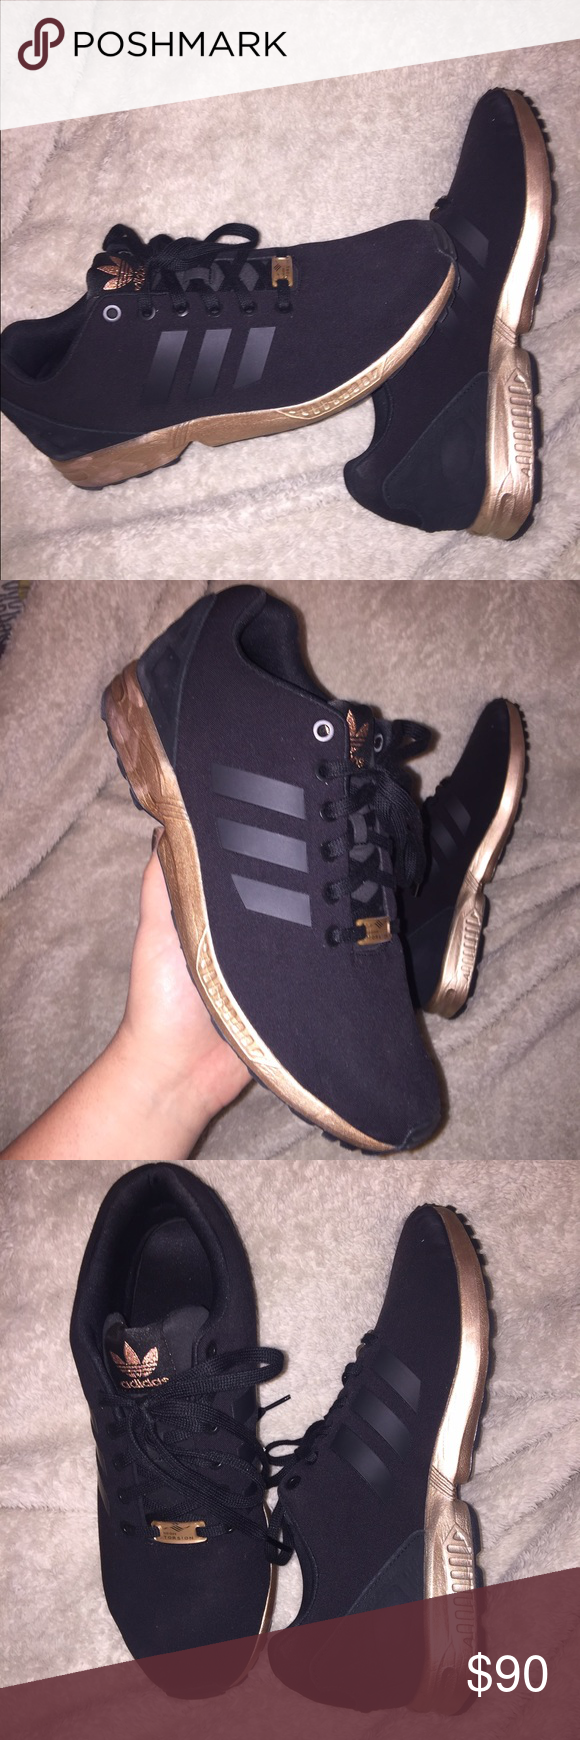 Adidas Torsion And Gold Black Rose Picks Adidas Shoes Posh My tqw68g